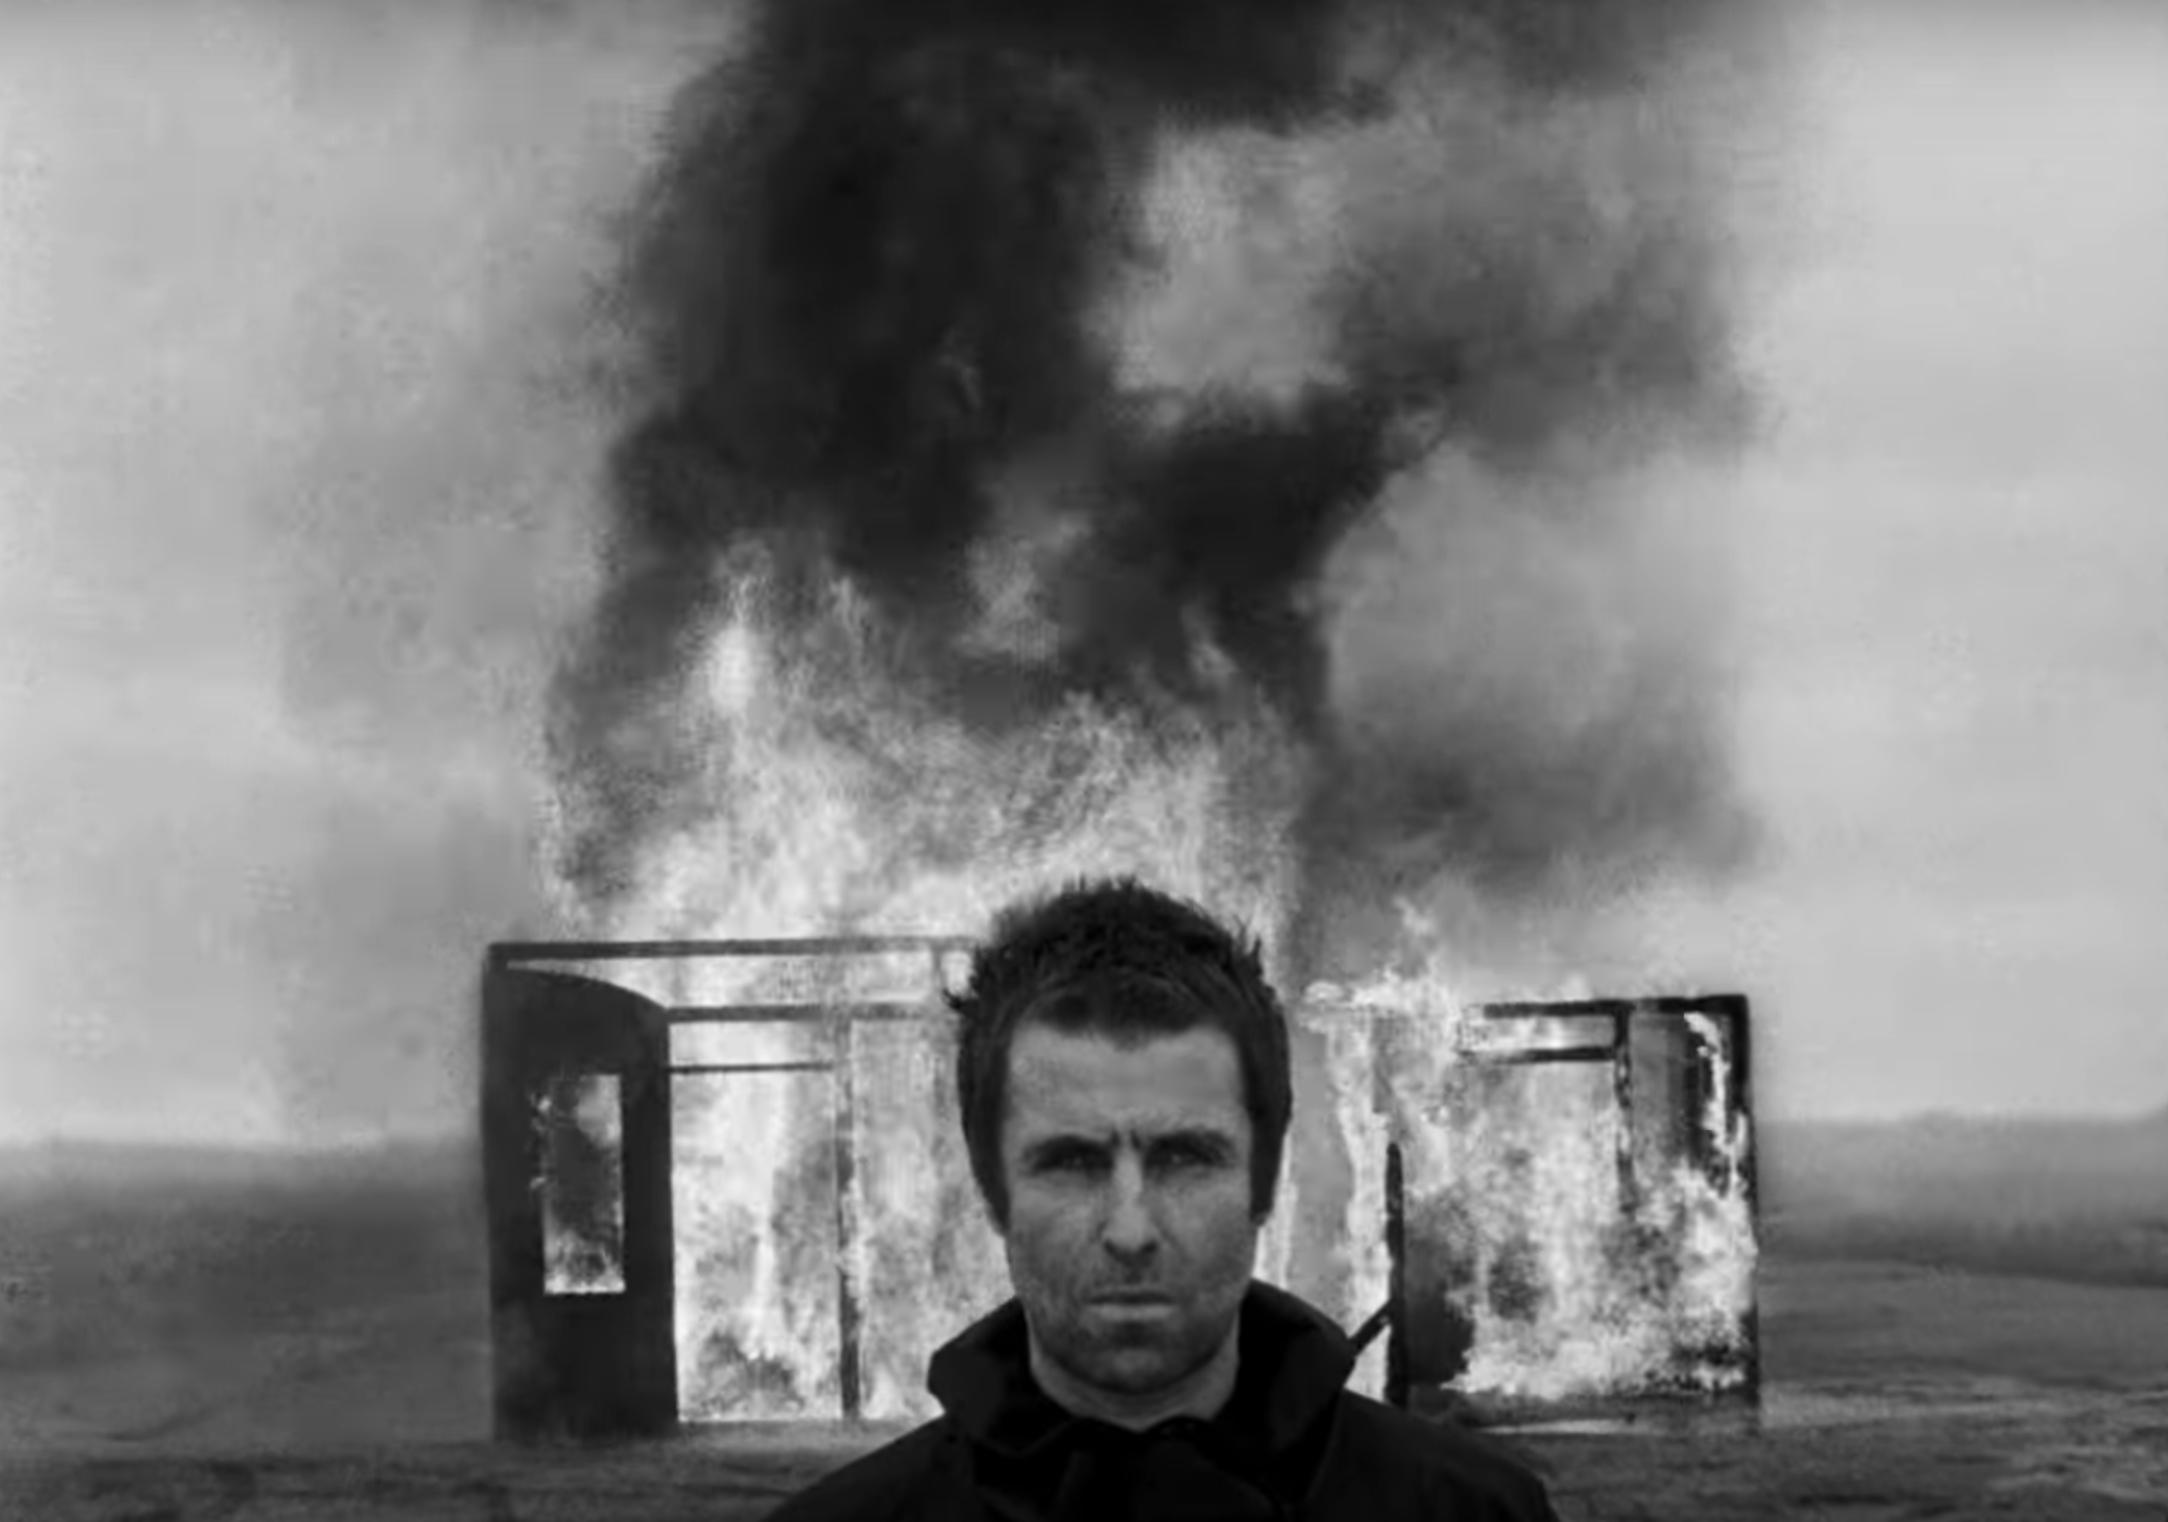 Liam Gallagher Shockwave